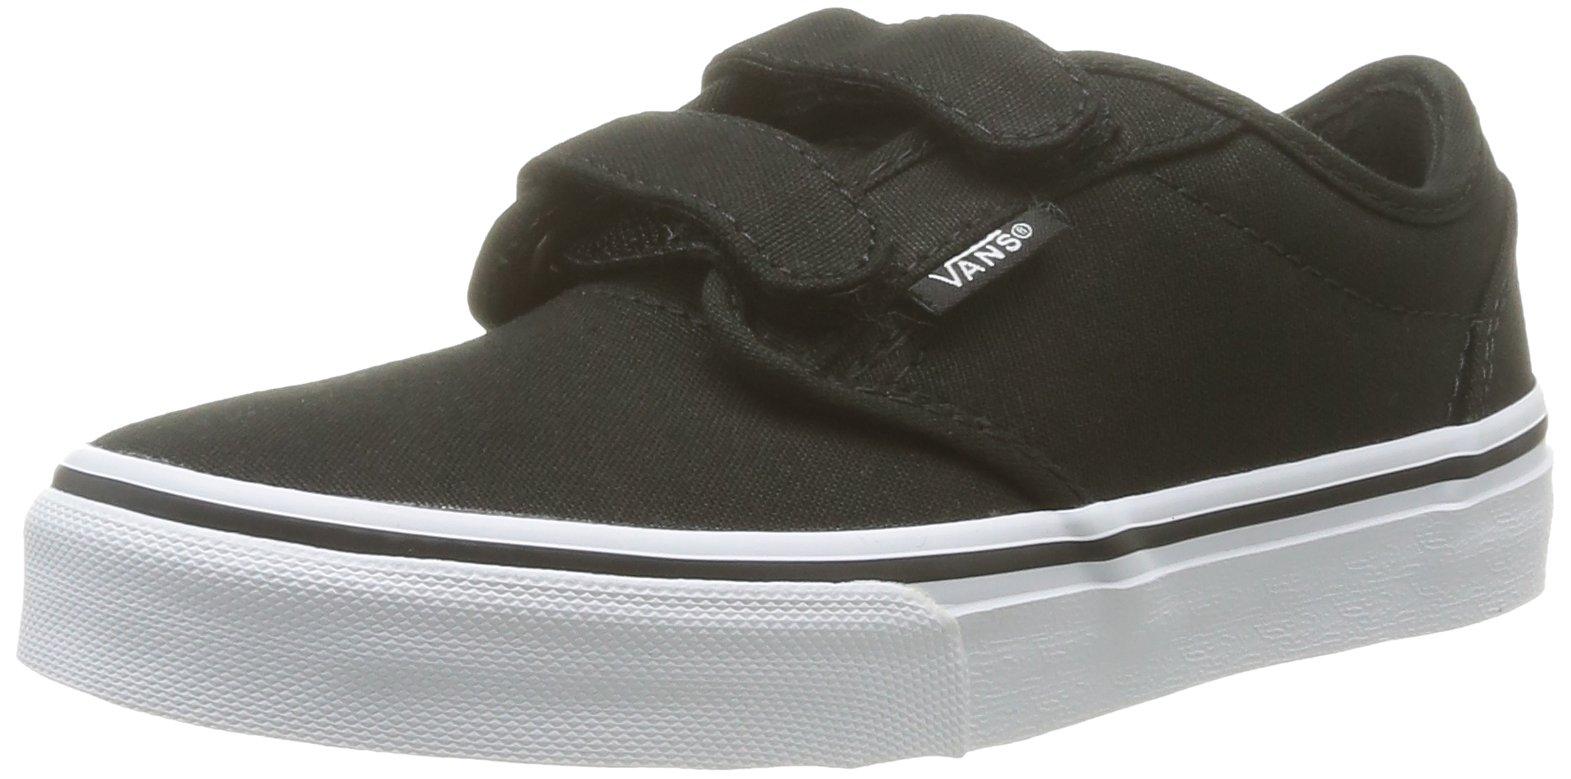 7f98969c588 Galleon - Vans Kids Atwood Canvas Strap Fasten Shoes Black White Size 2